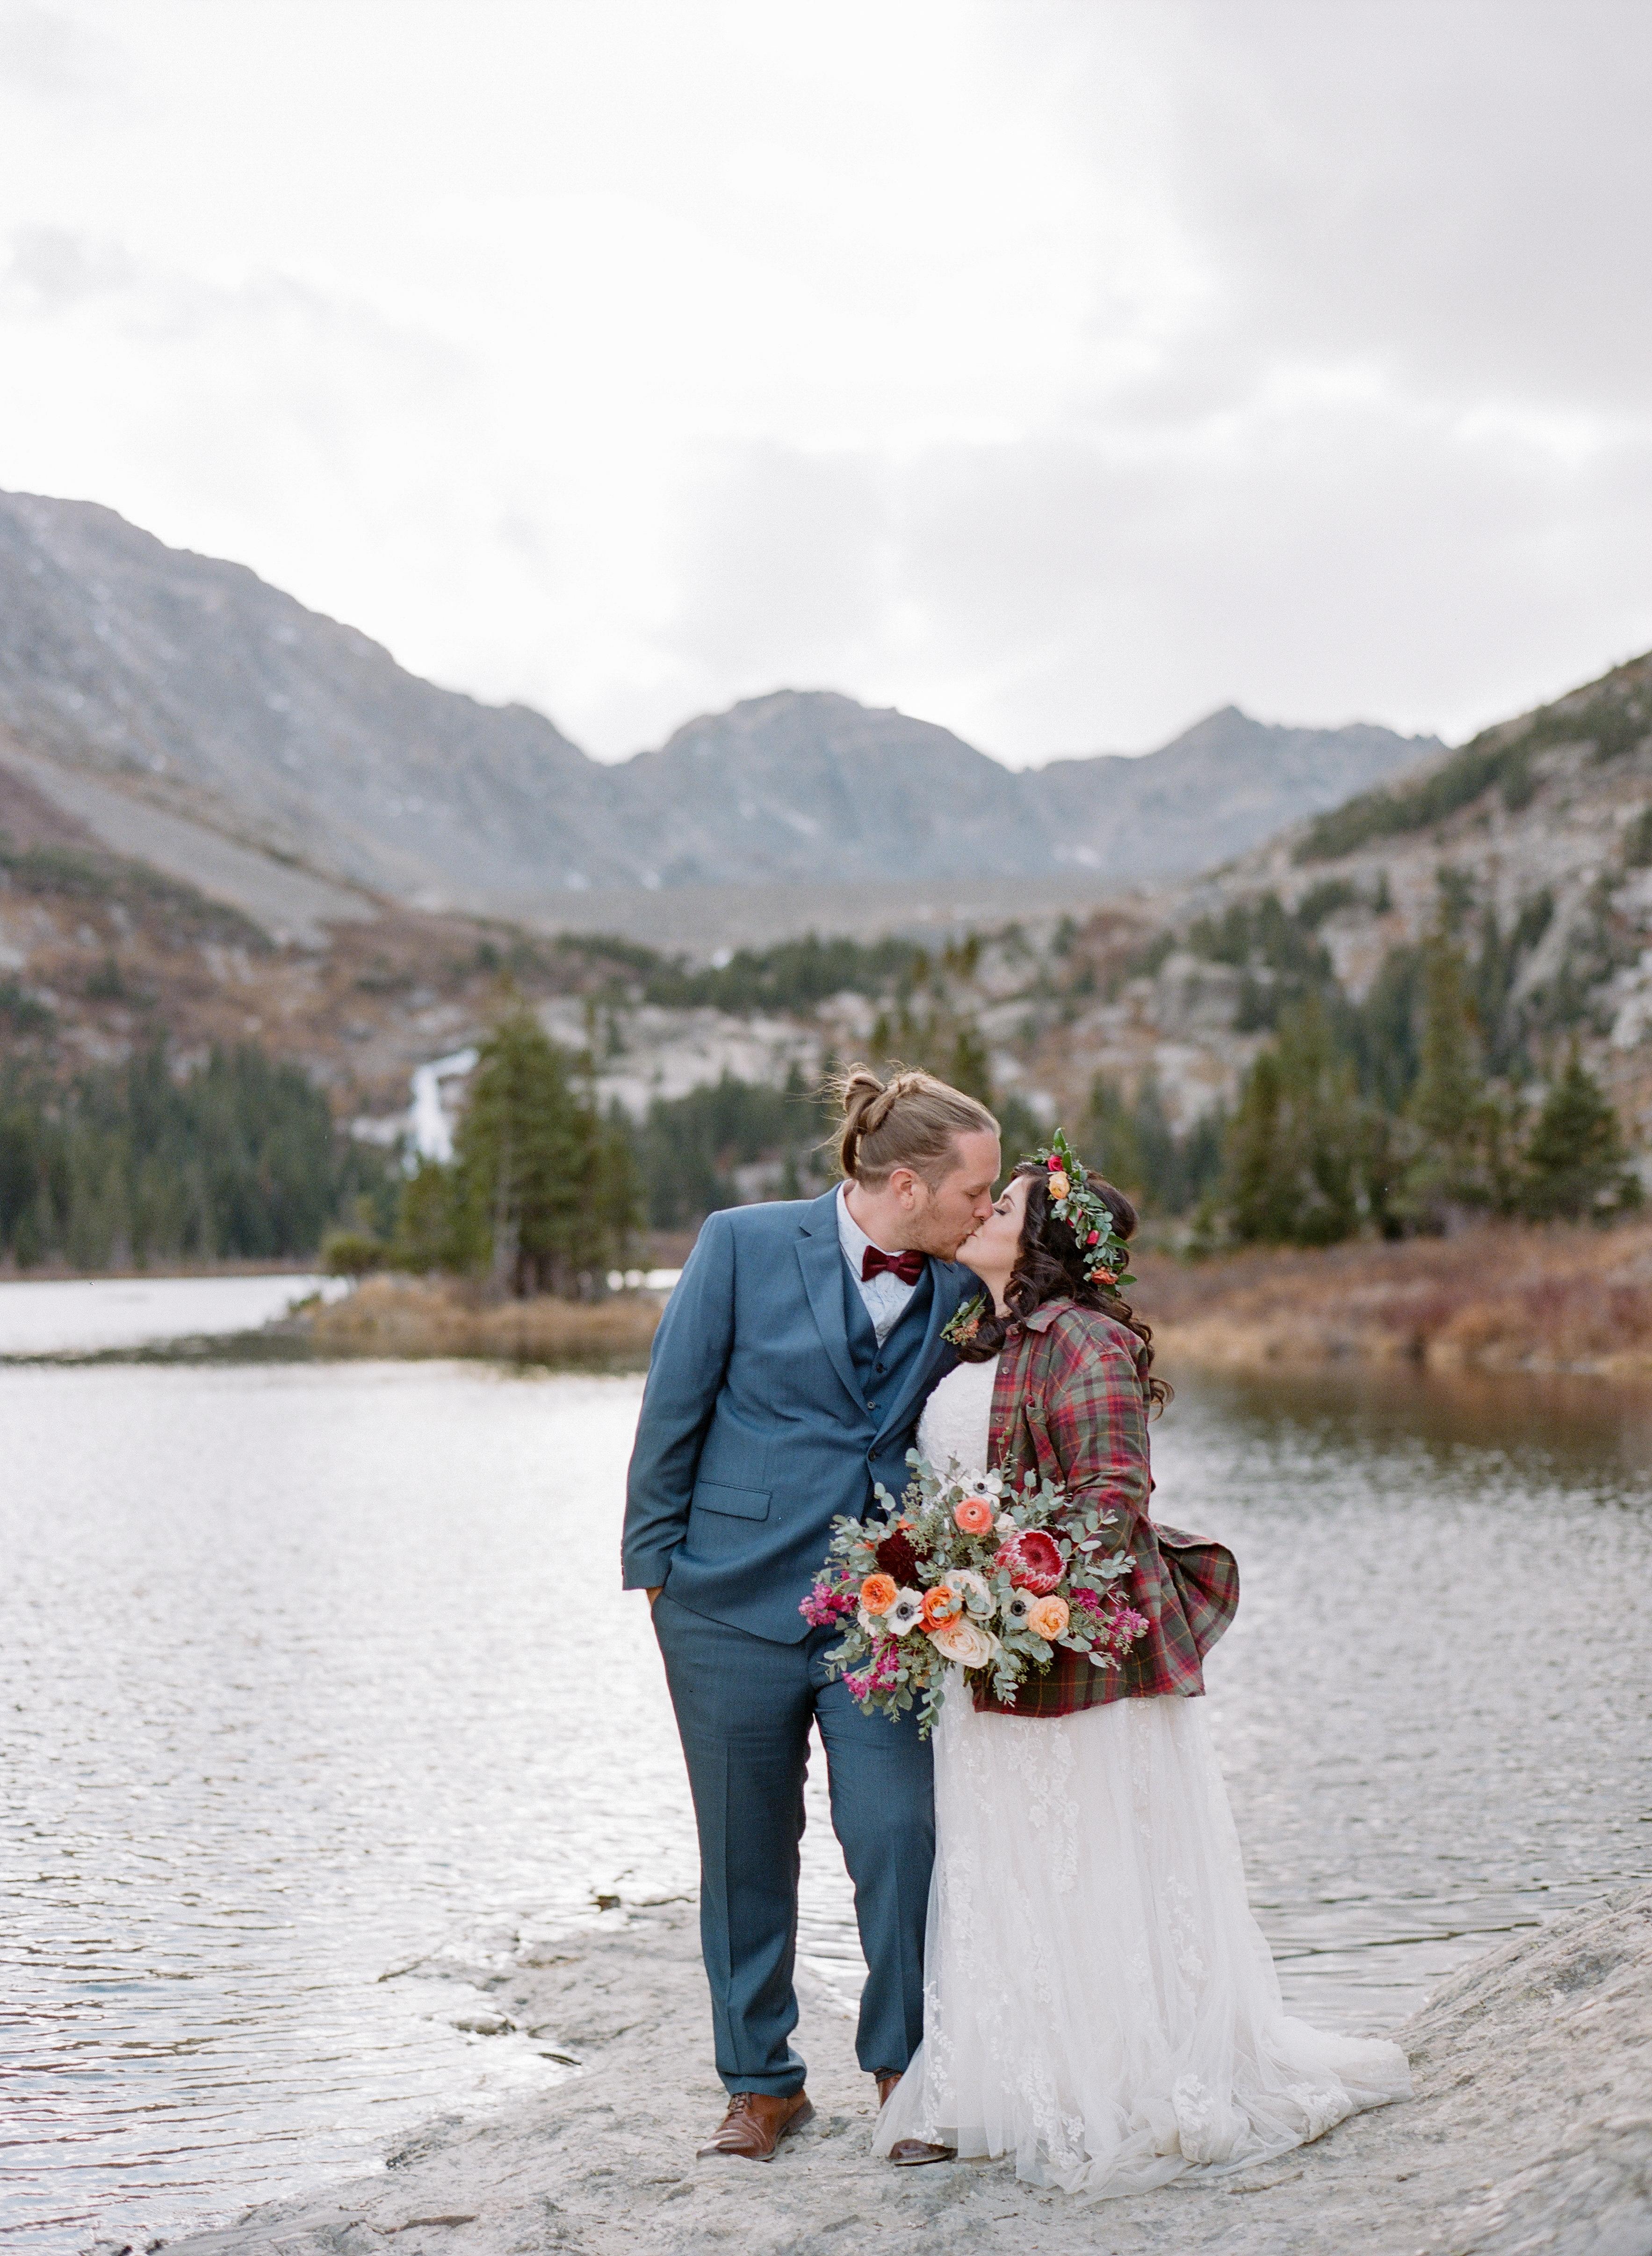 Private-Home-Rental-Wedding-VRBO-Fall-Breckenridge-Colorado-Blue-Lakes-Bride-and-Groom